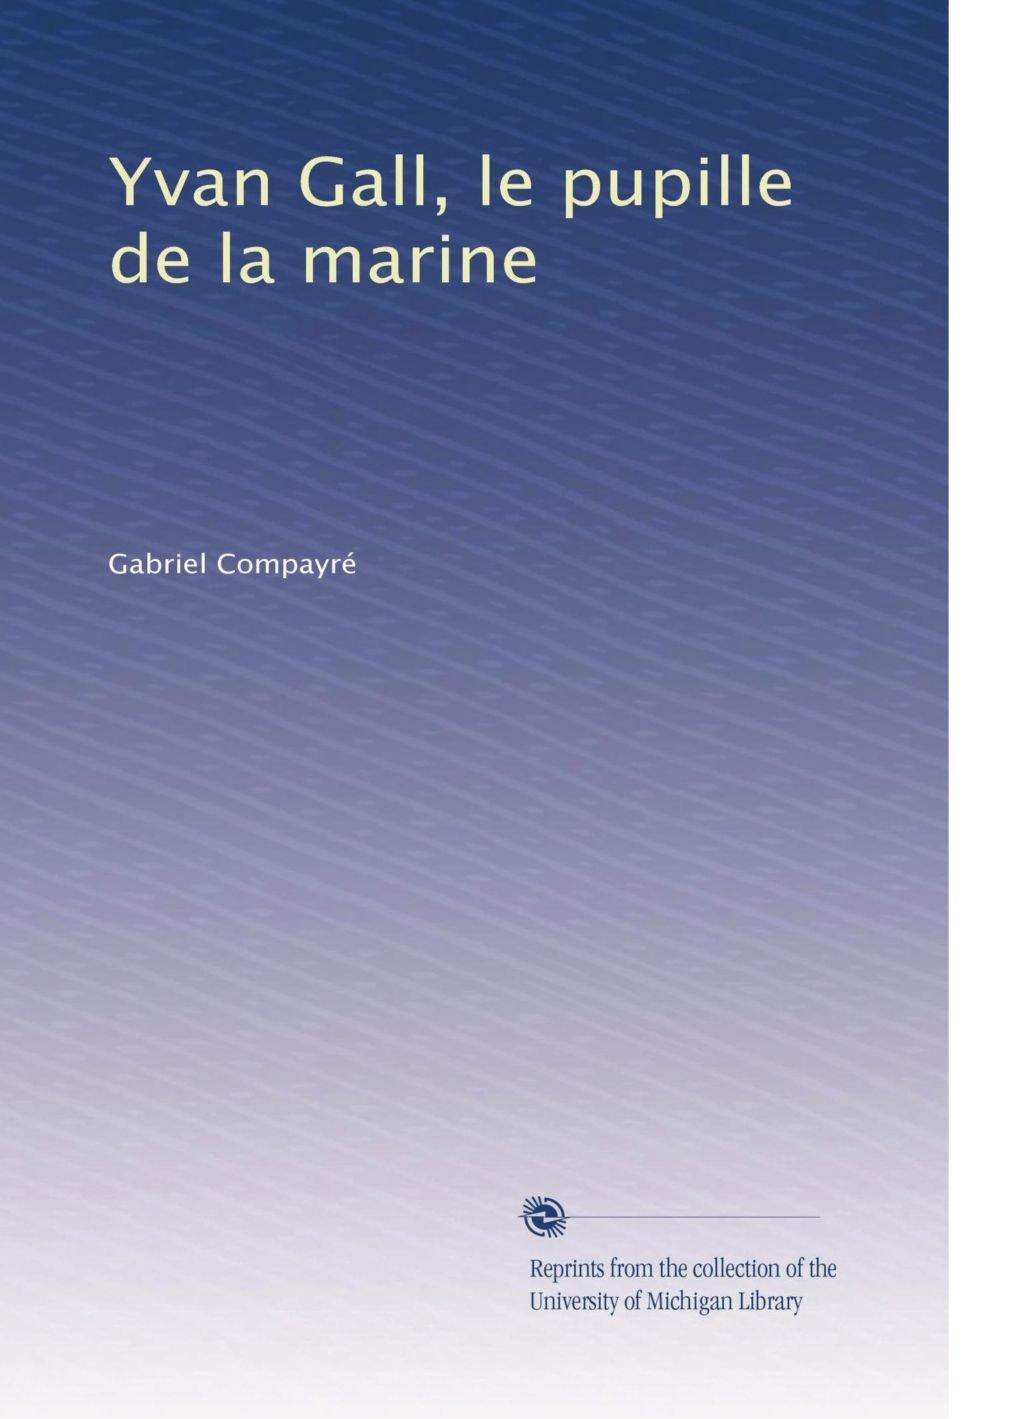 Download Yvan Gall, le pupille de la marine (French Edition) PDF